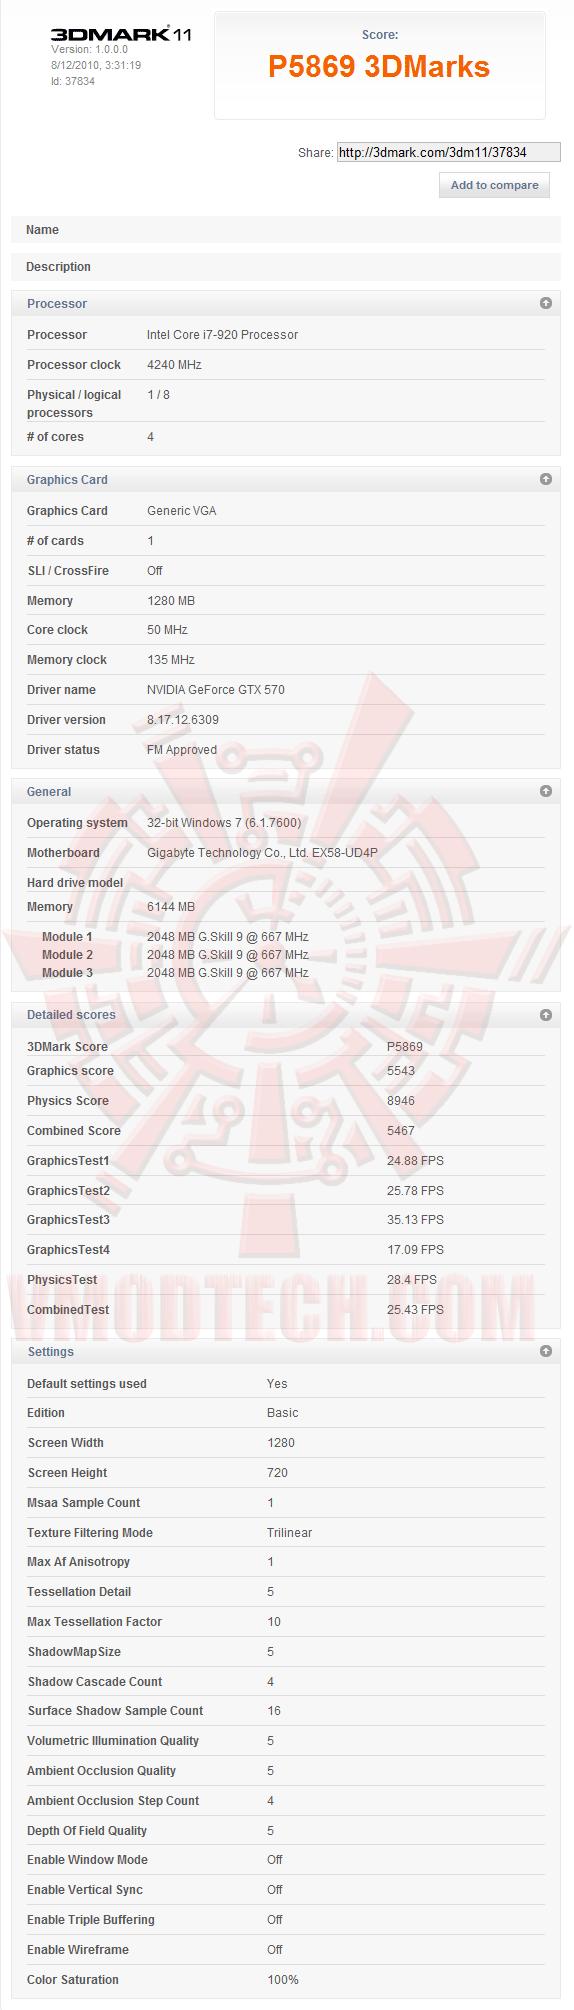 11 oc NVIDIA GeForce GTX 570 1280MB GDDR5 Debut Review